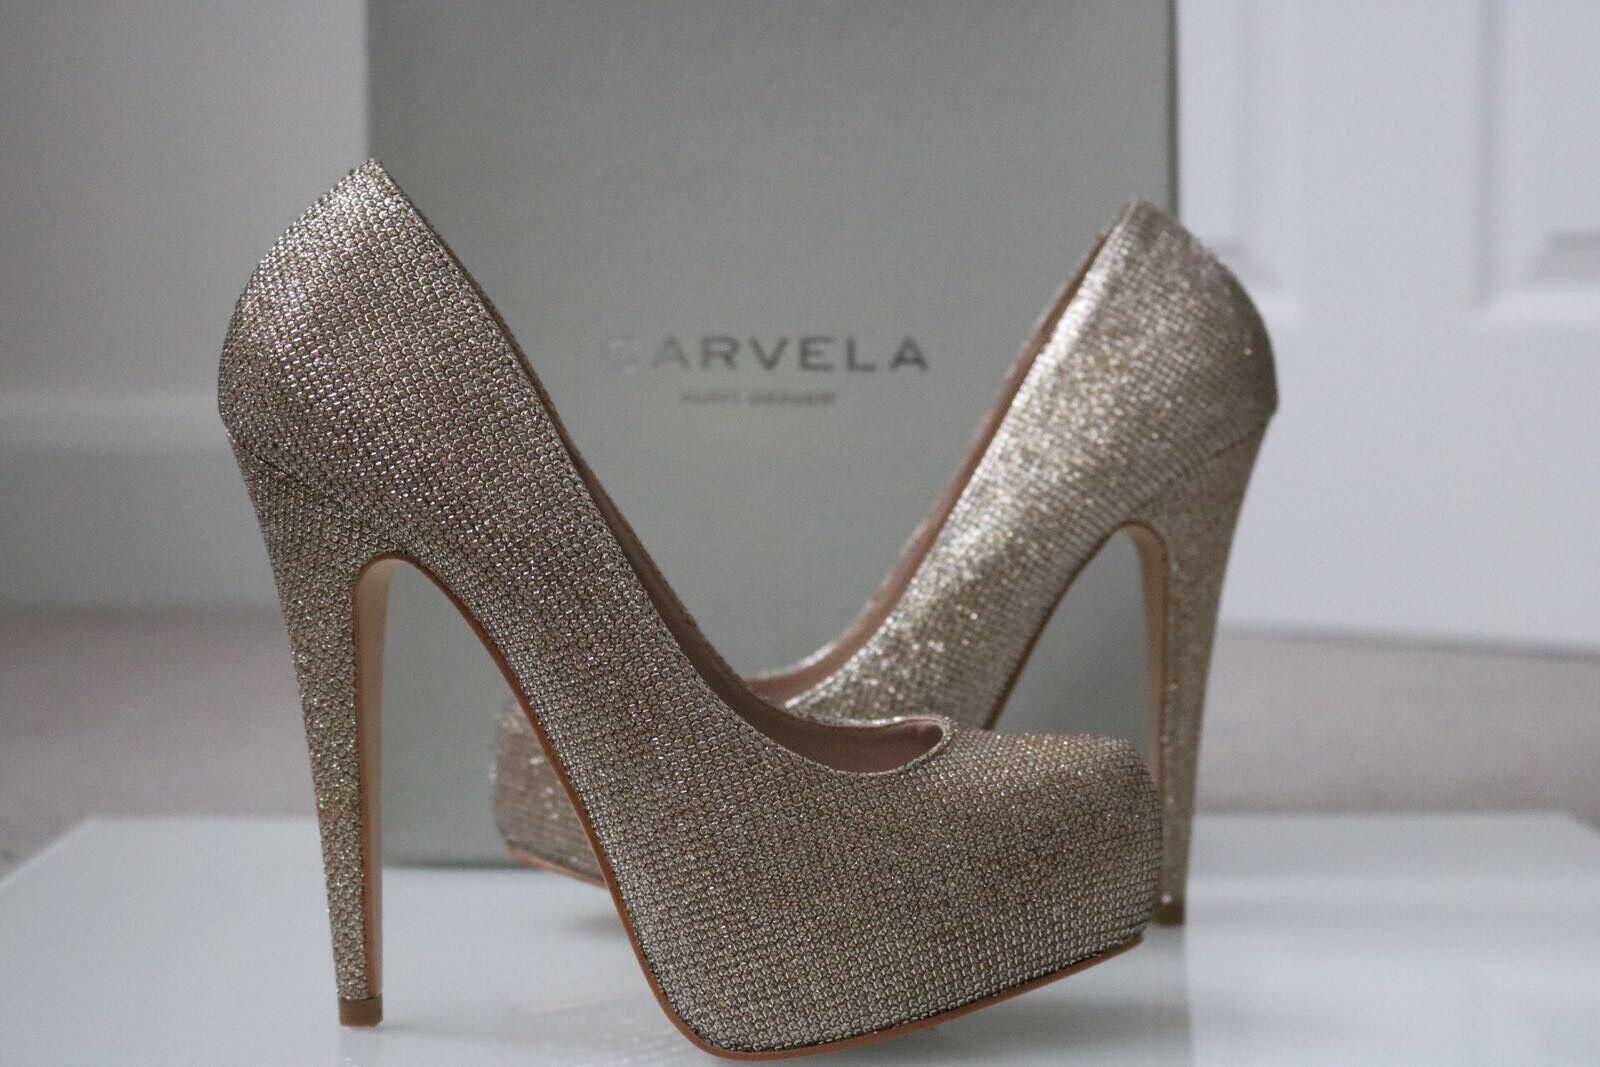 Carvela gold Glitter Kaci Size 4 37 Kurt Geiger Heel shoes